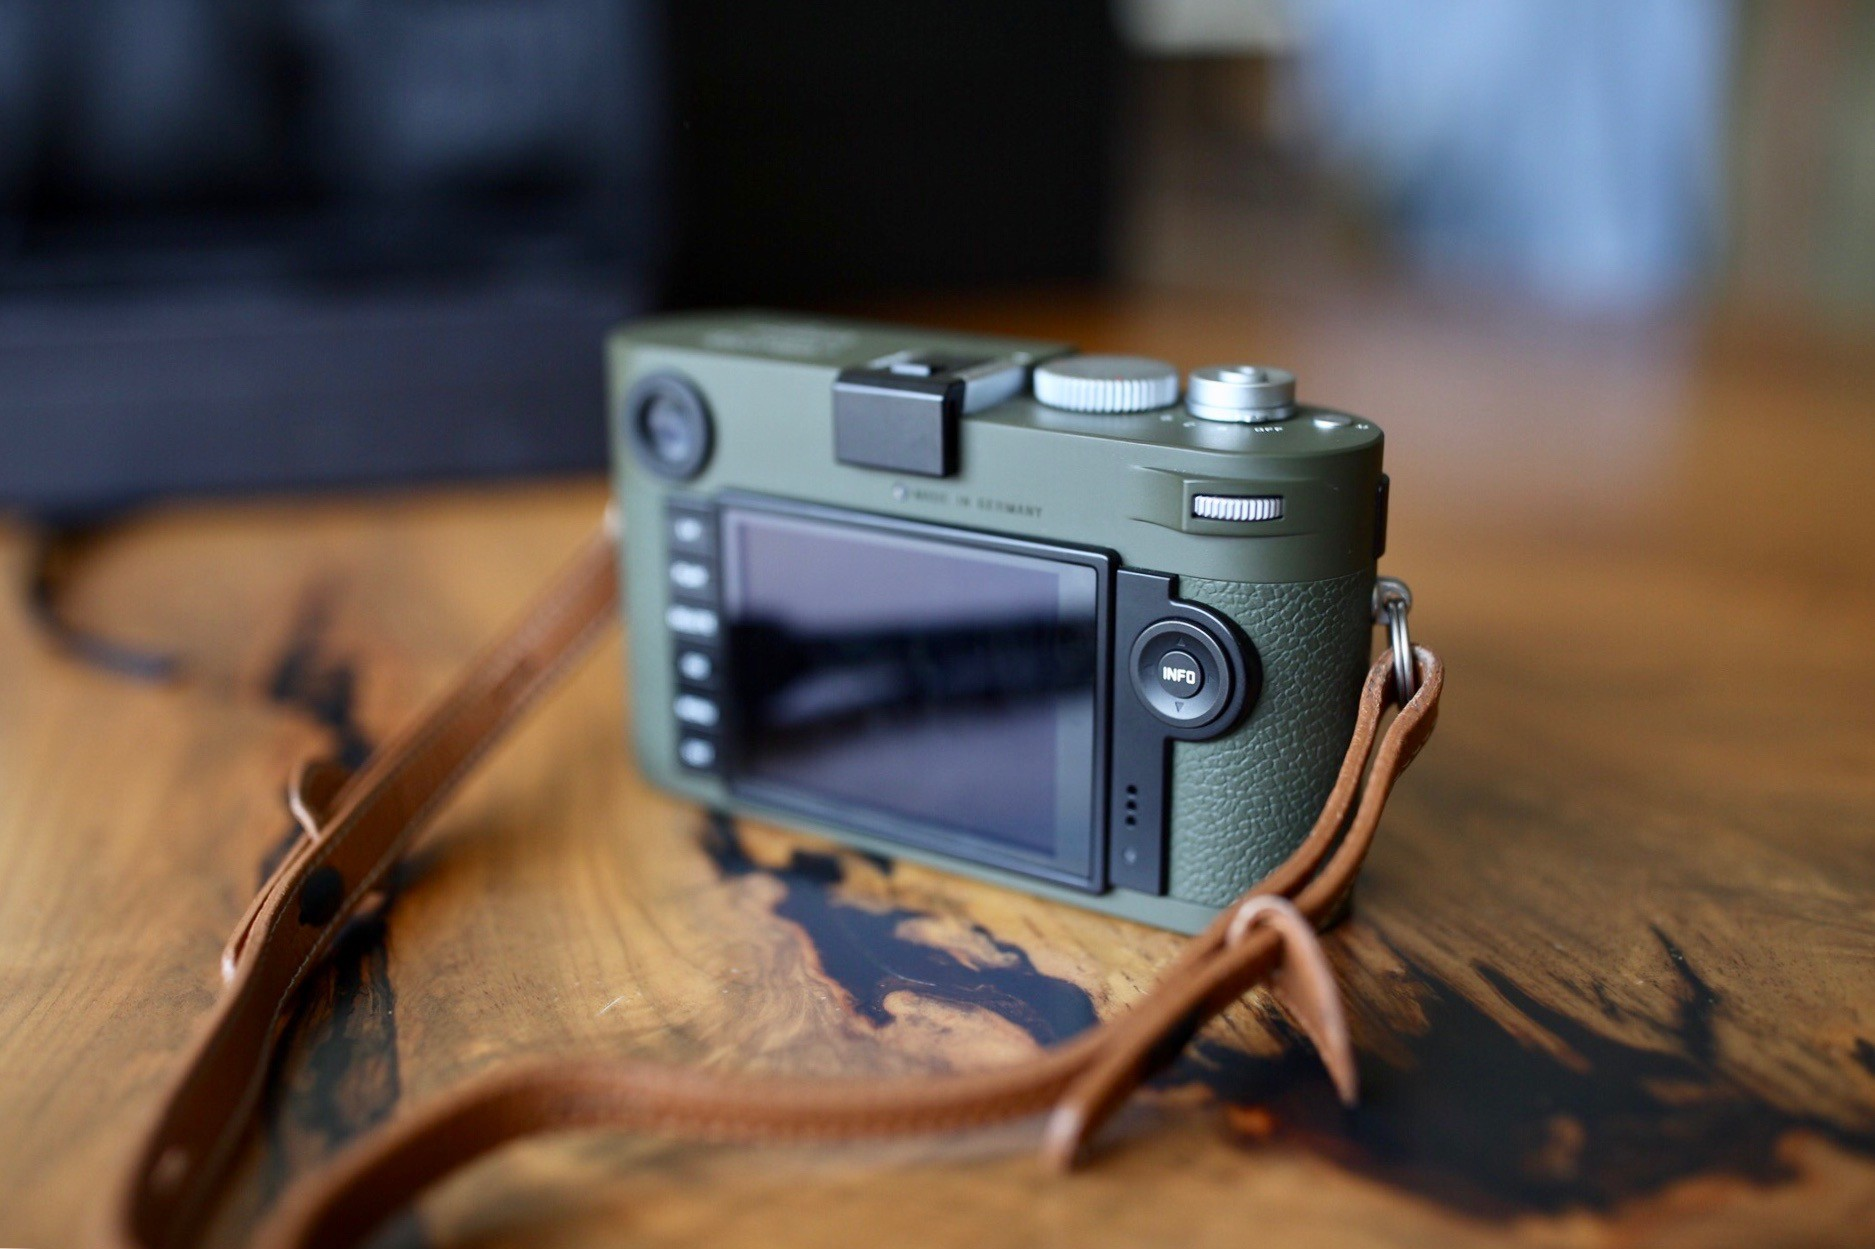 Leica M-P 240 (limited edition 1,500 set) | ThePhotoForum: Film